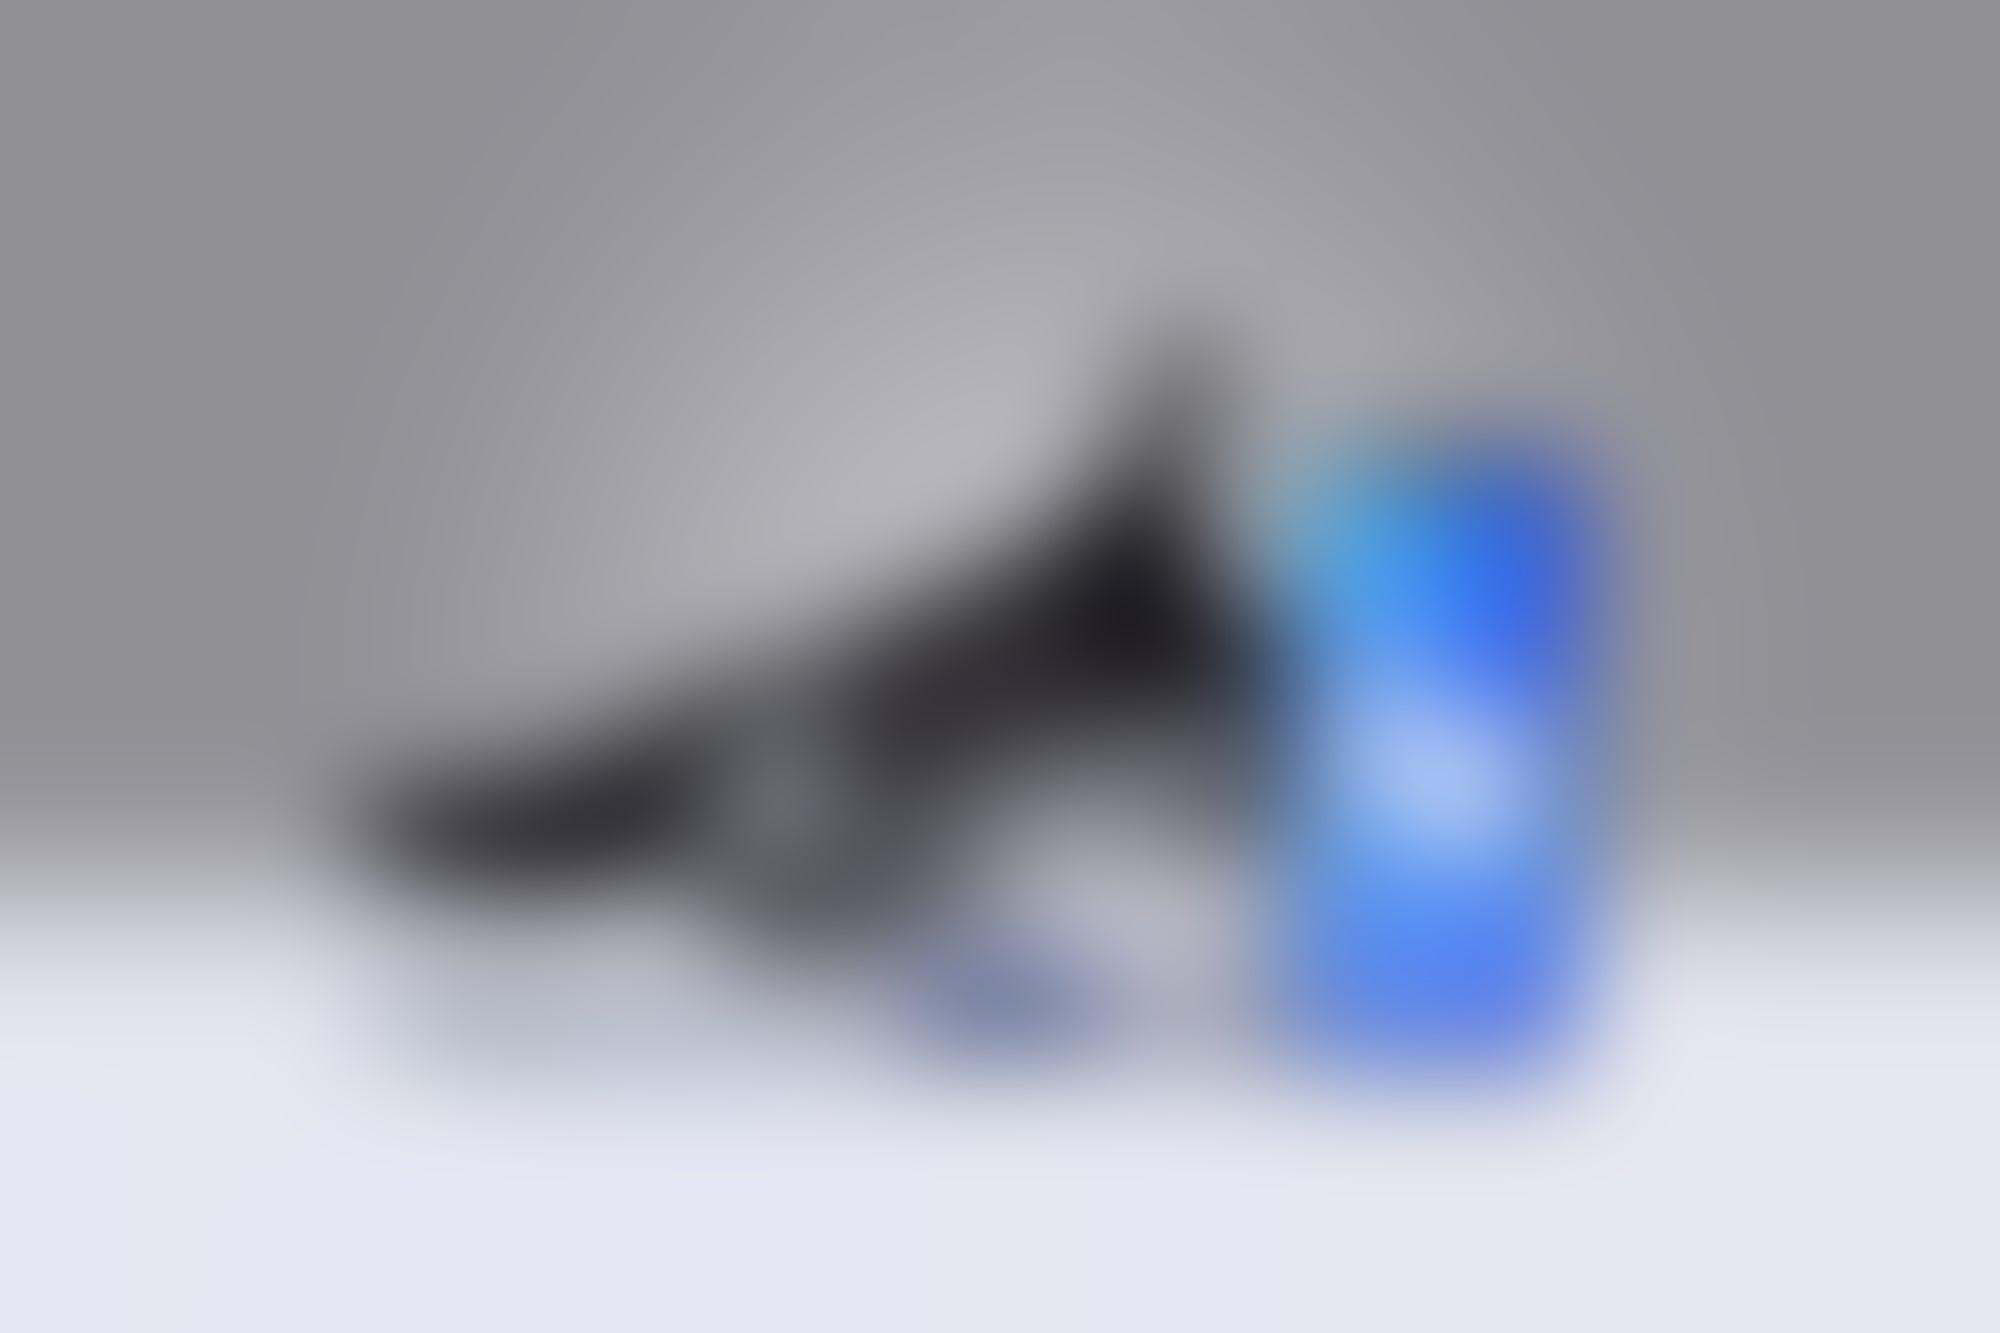 Faulty Update Bricks Nike 'Self-Lacing' Smart Shoes